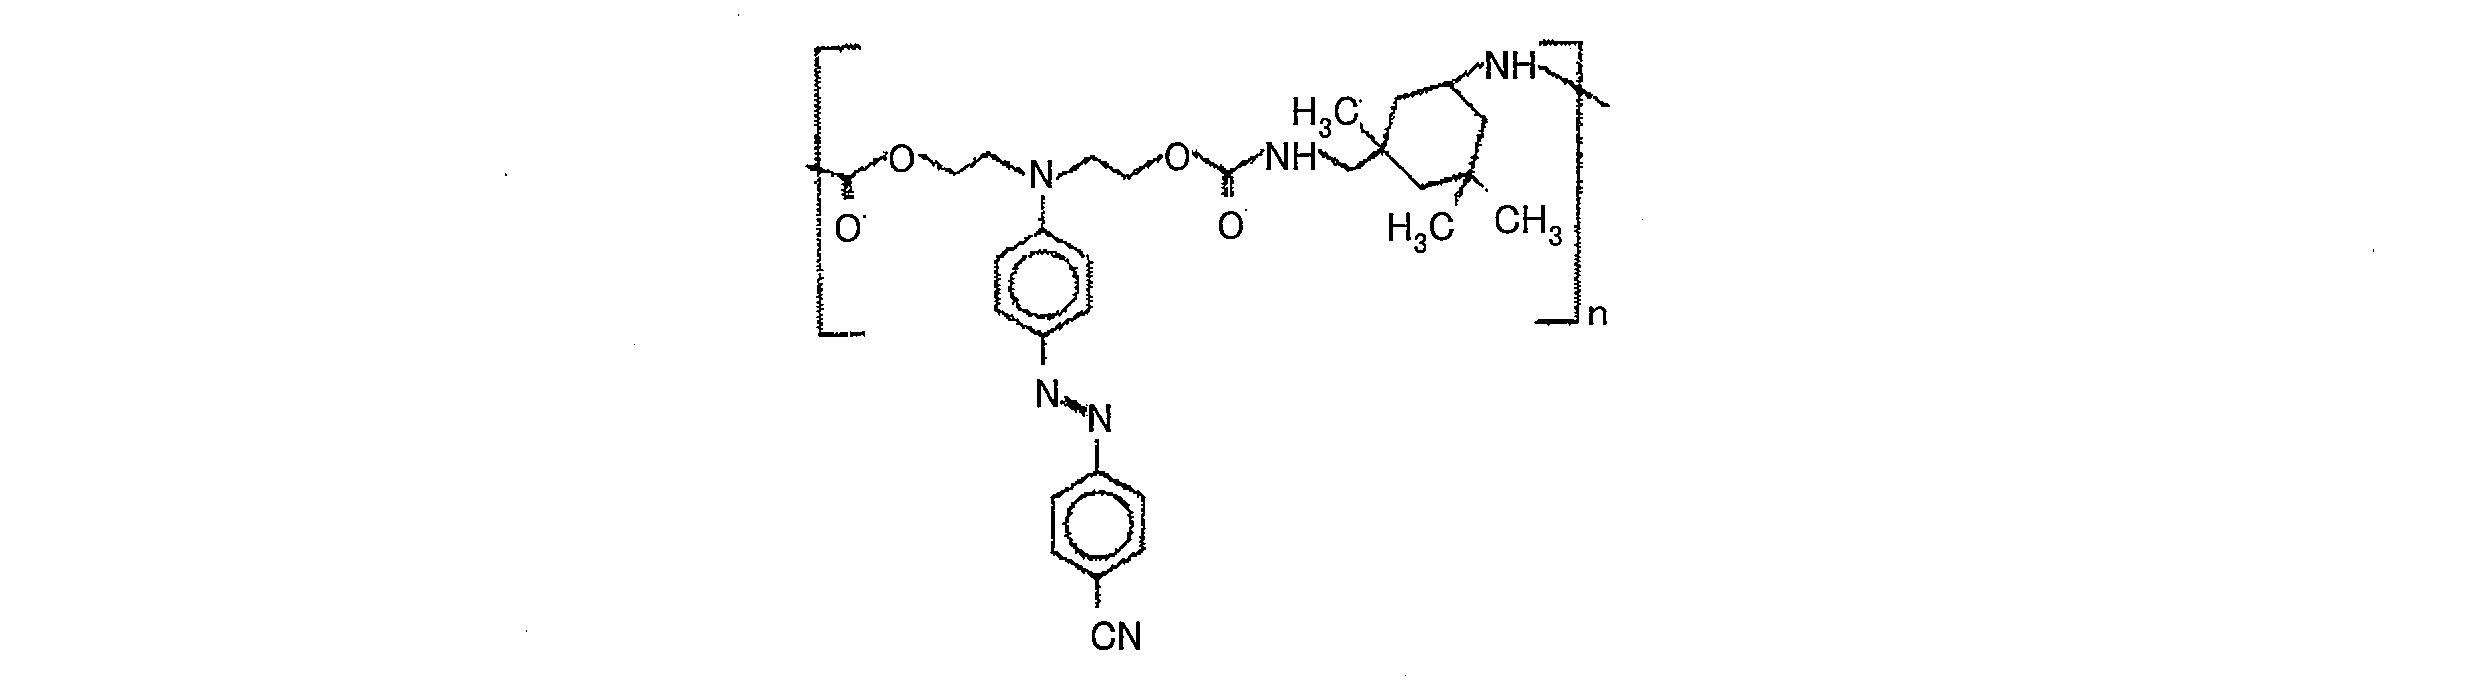 Patent Wo2011121857a1 Ƨ�造体、局在型表面プラズモン共鳴センサ用チップ、及び局在型表面